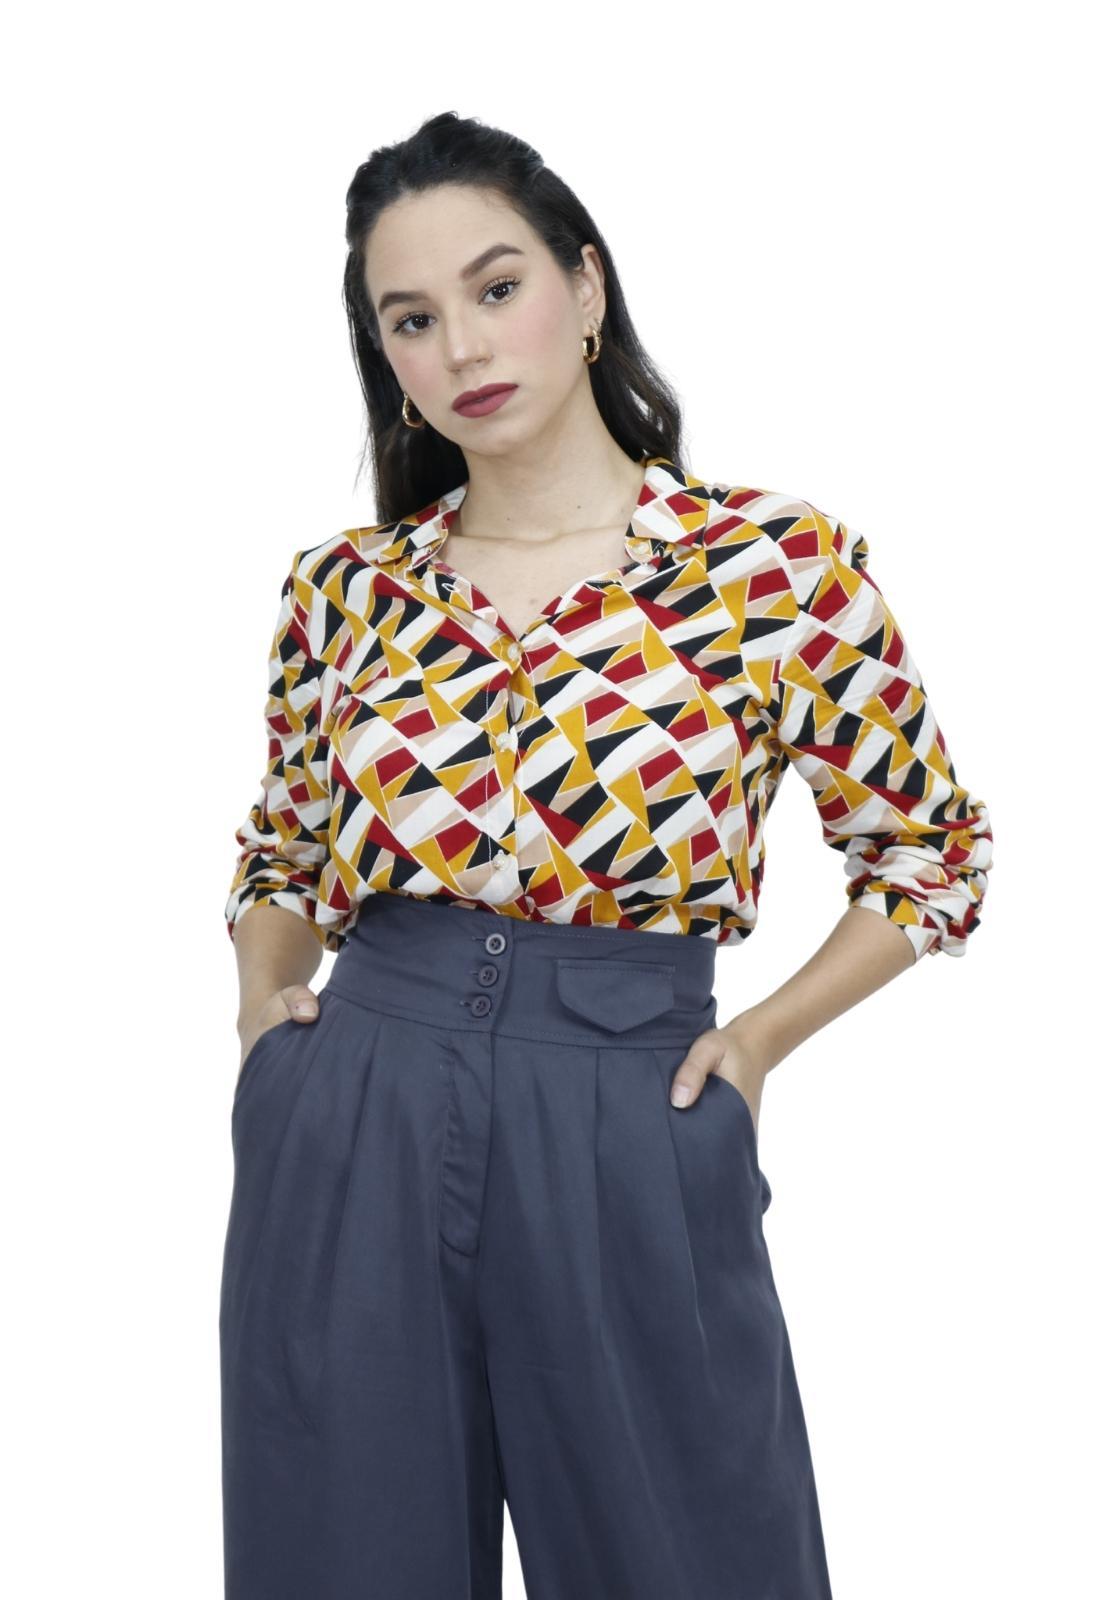 Camisa Feminina Manga Longa Estampa Geométrica